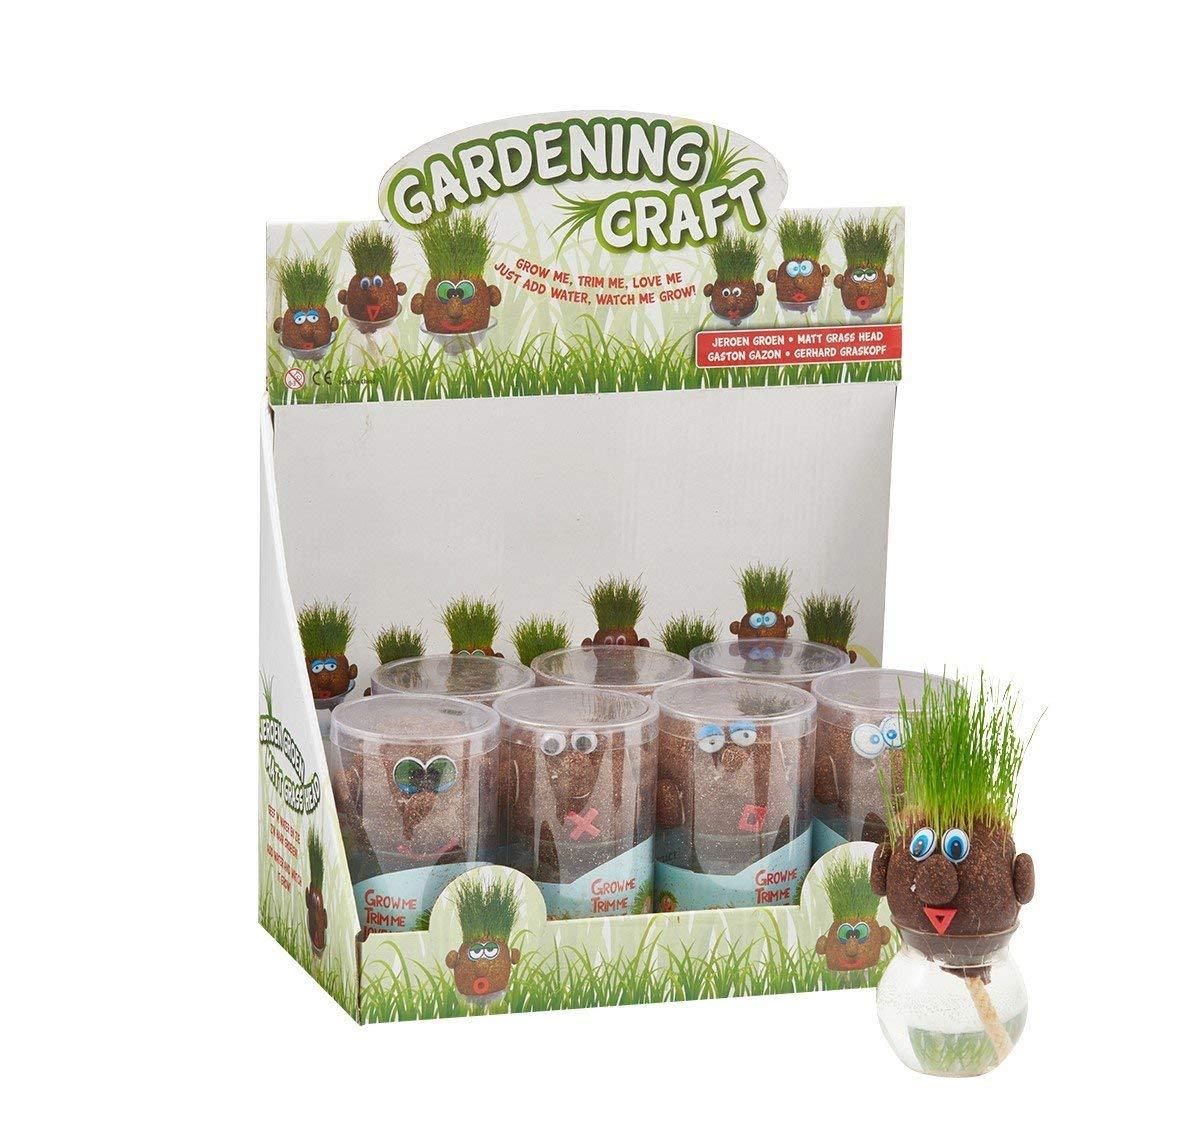 Tobar Gufo grasshead